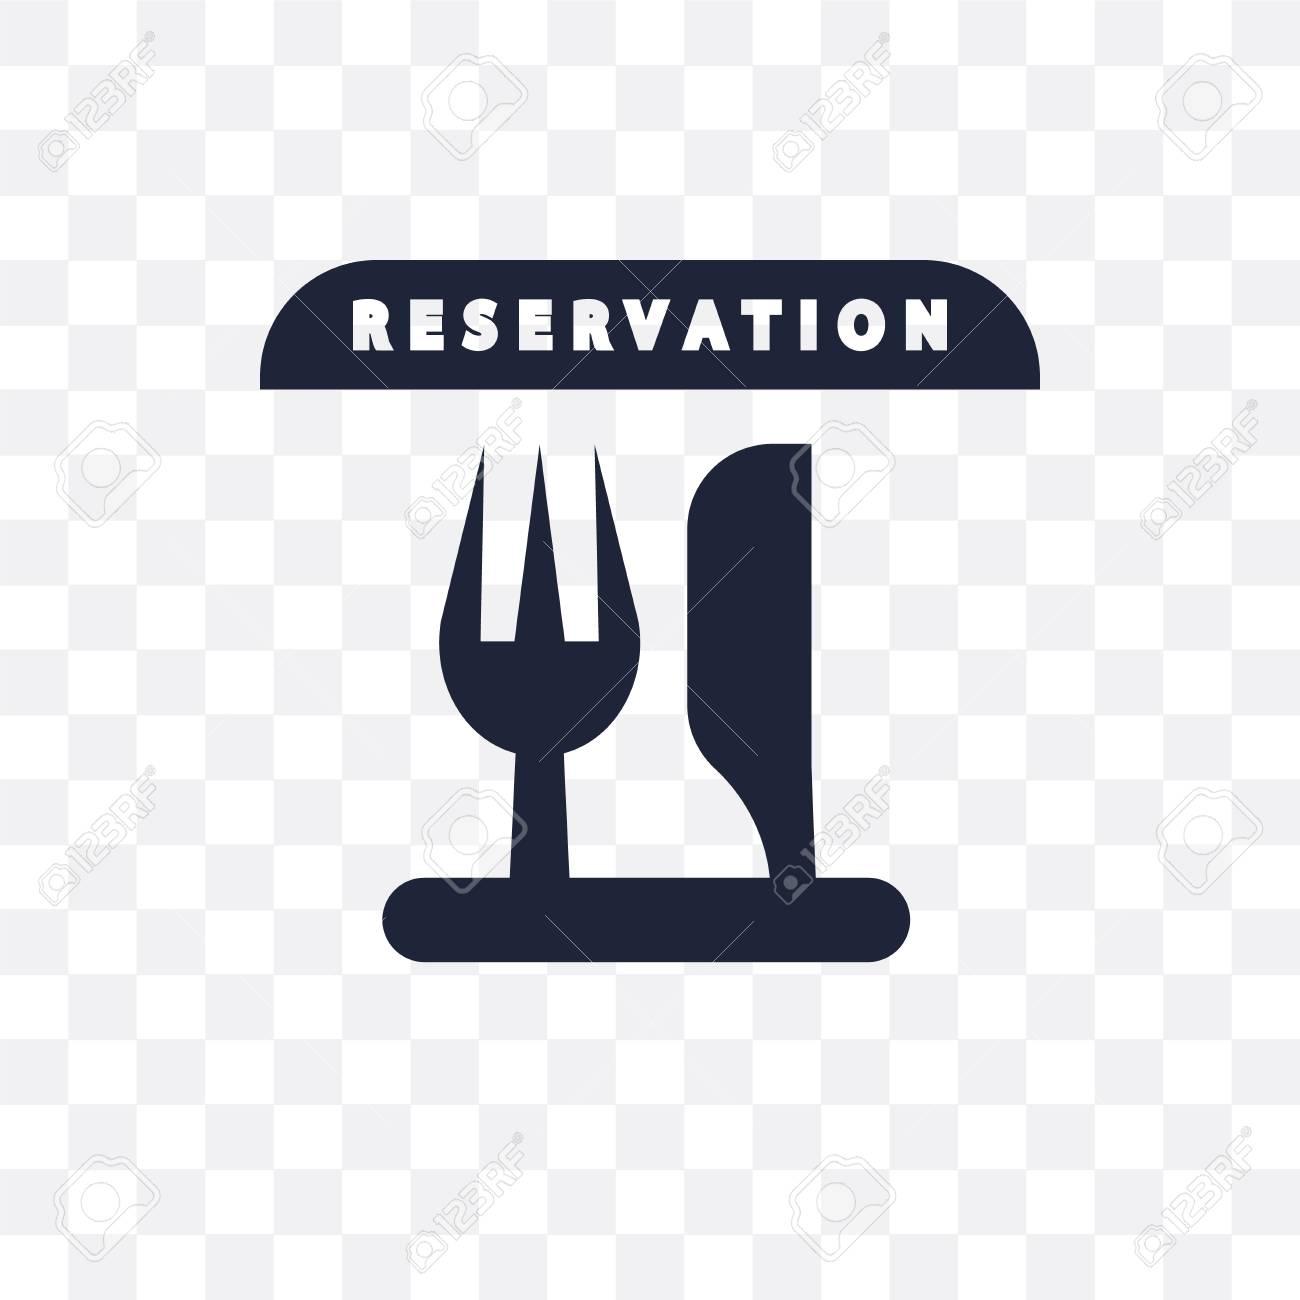 Reservation Transparent Icon Reservation Symbol Design From